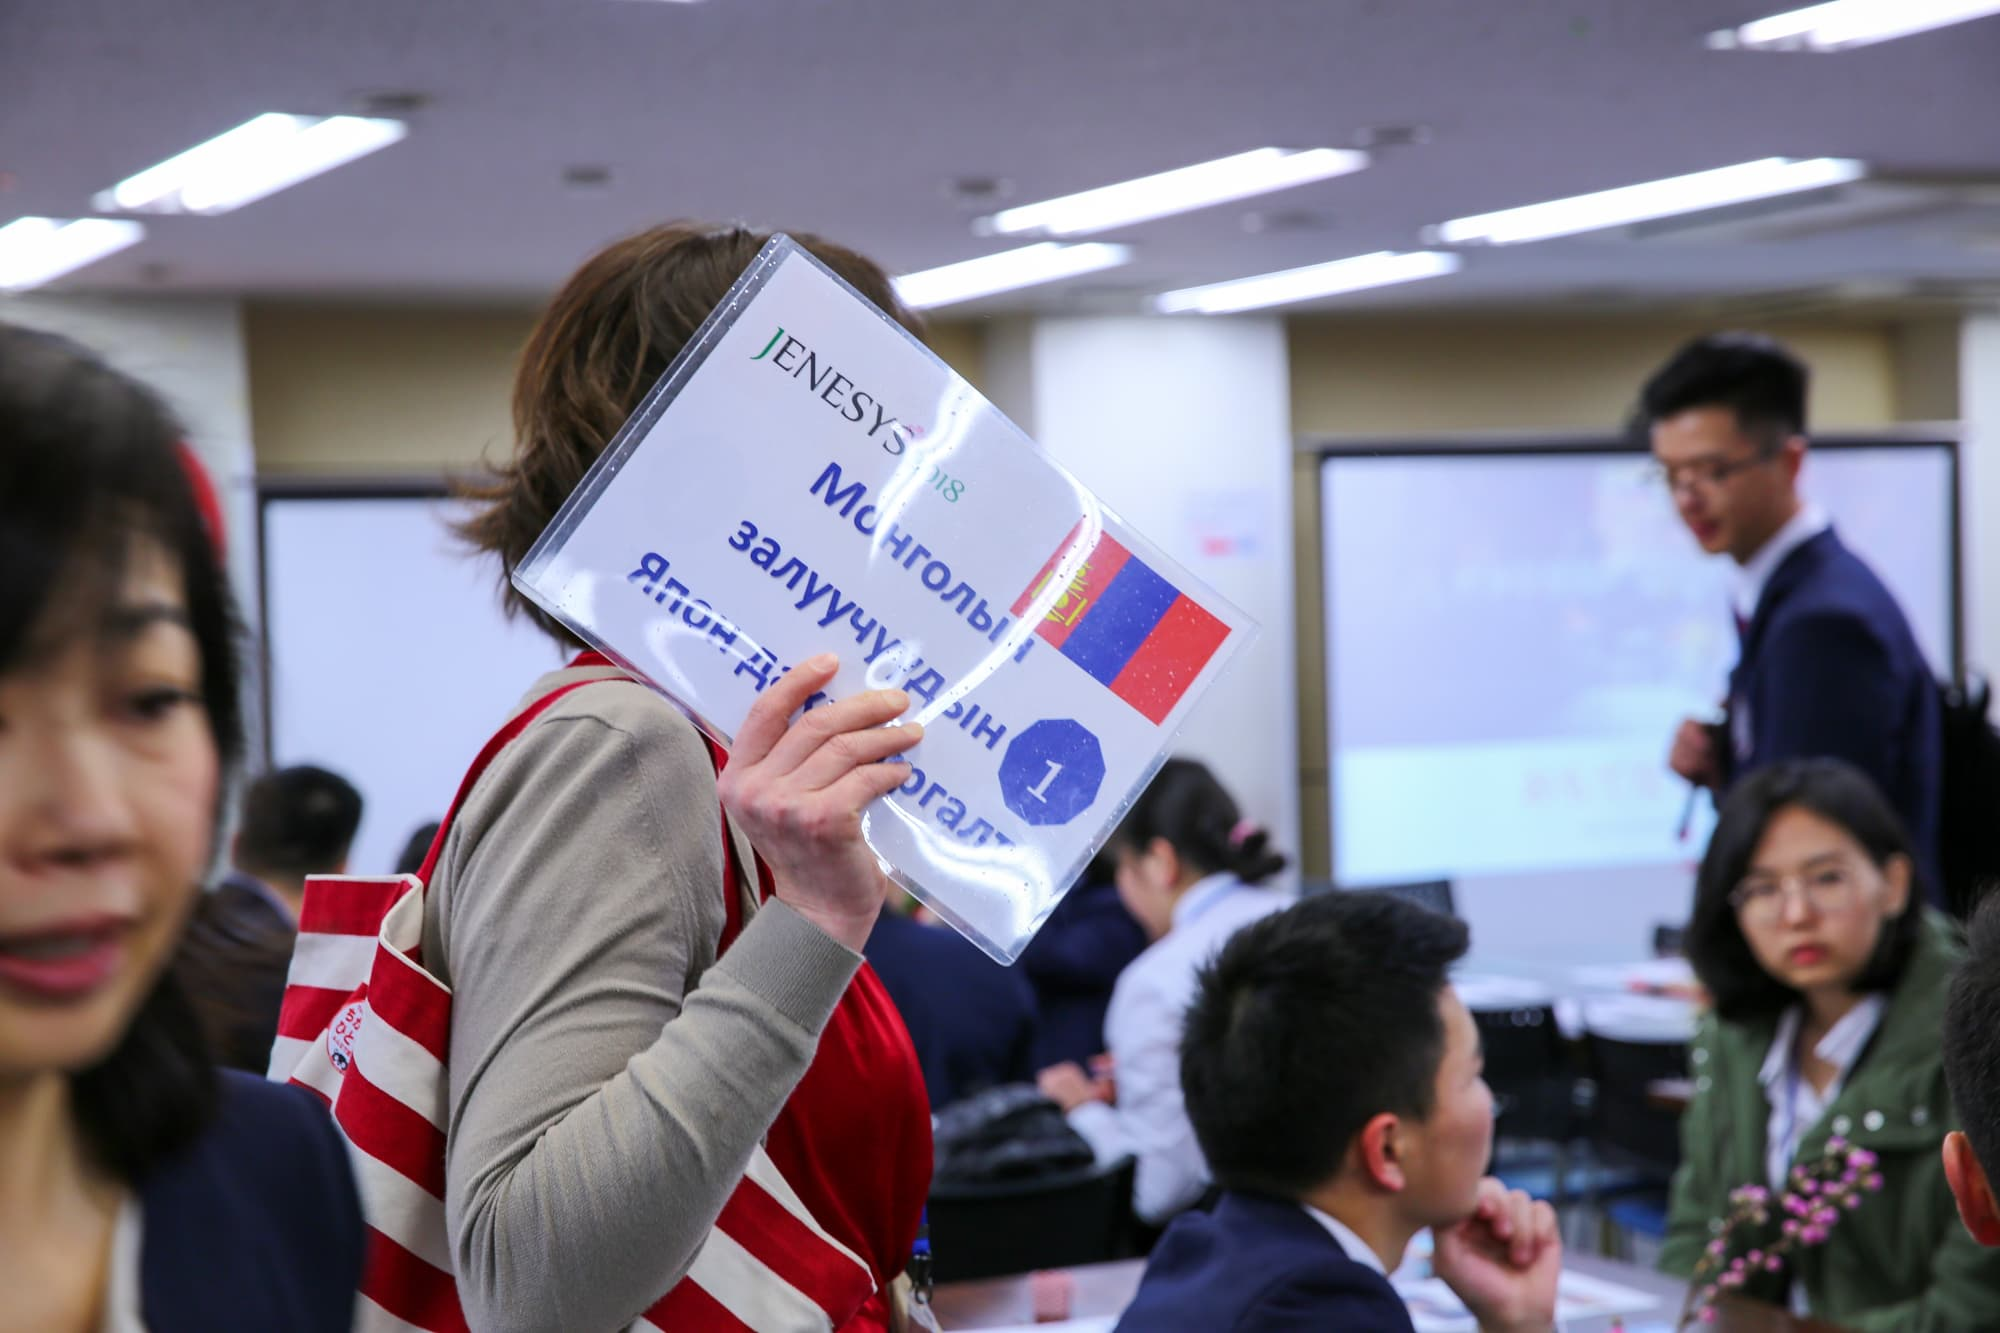 JENESYS2019 モンゴル国「おもてなし研修」